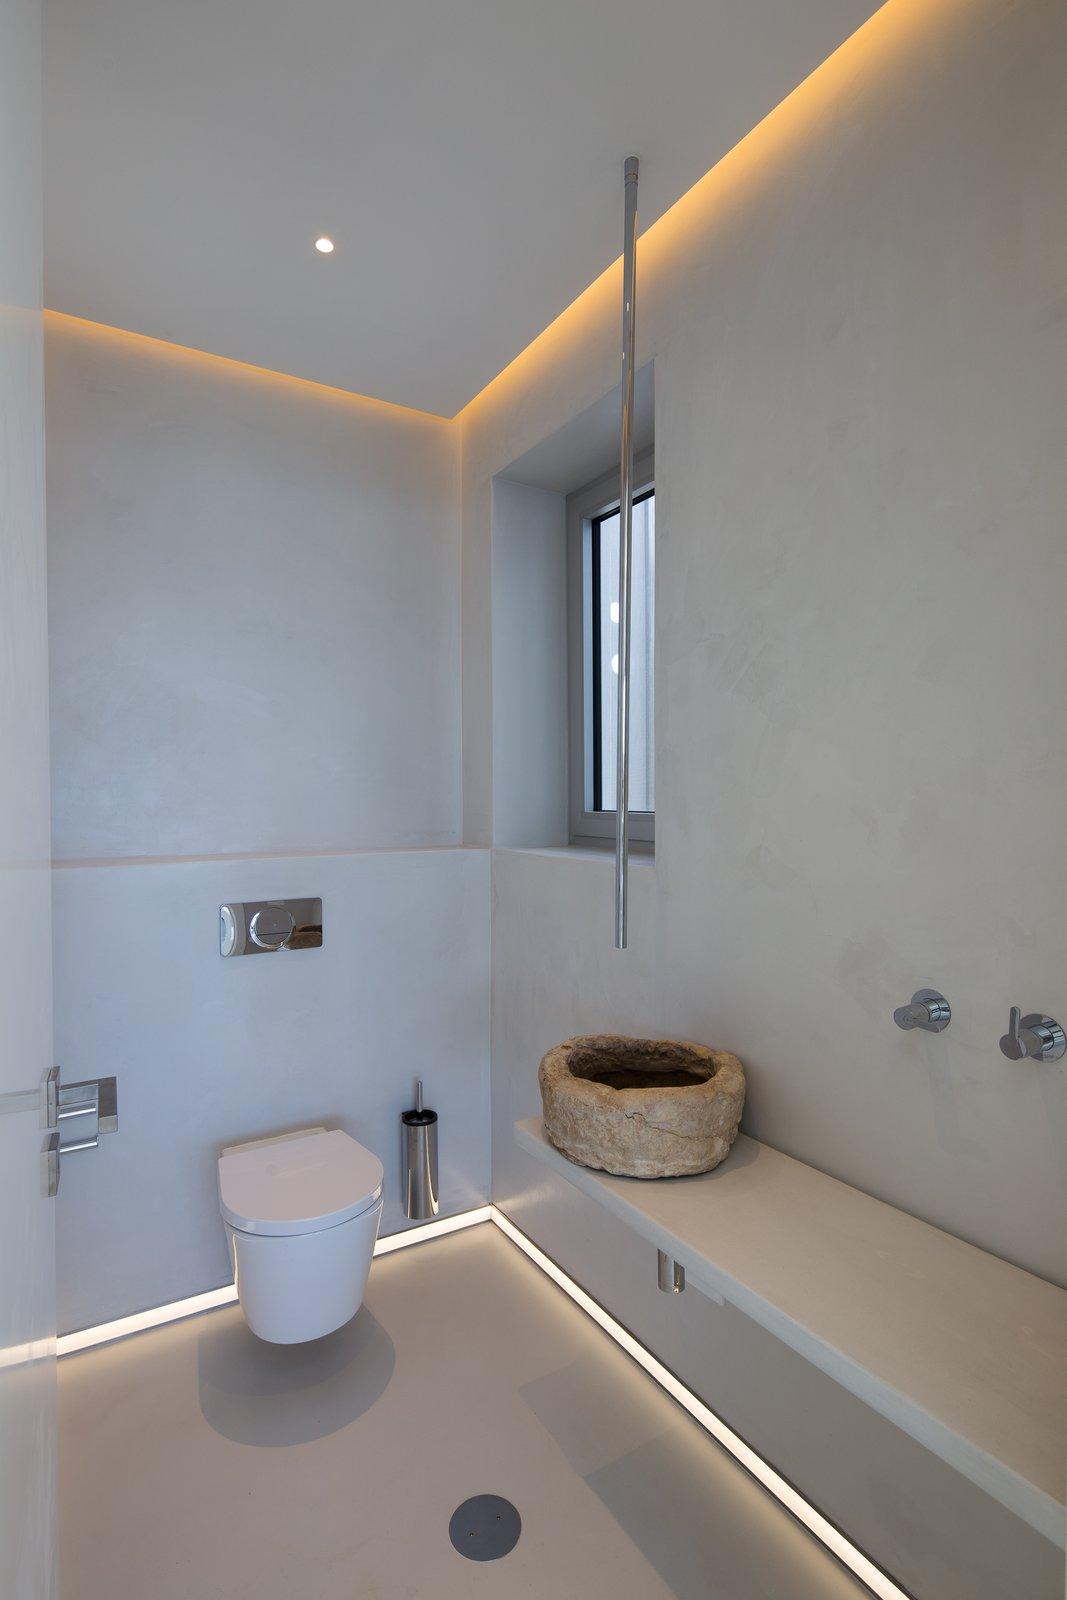 Villa GK bathroom with hanging faucet